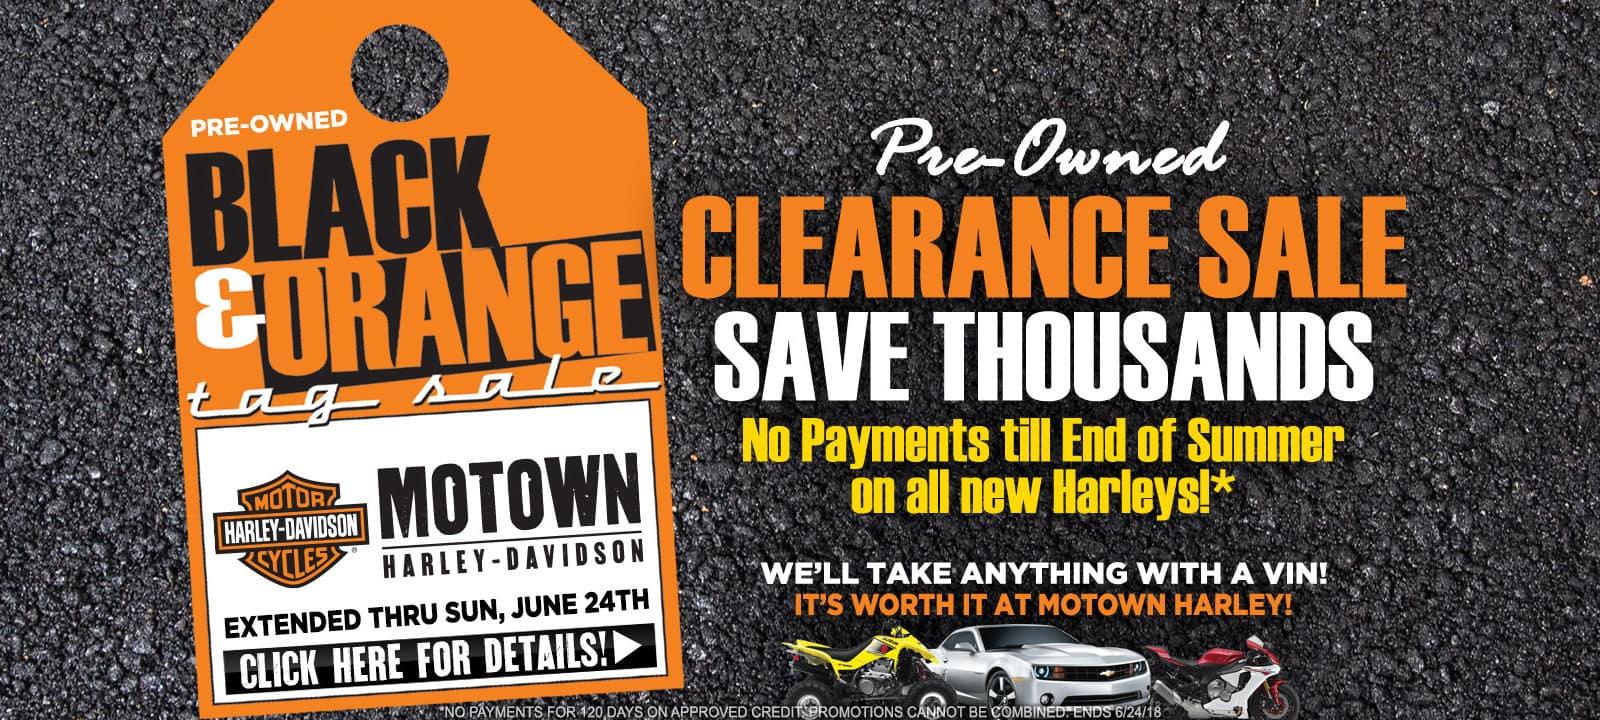 20180618-MHD-1800x720-Black-&-Orange-Tag-Sale-&-No-Payments